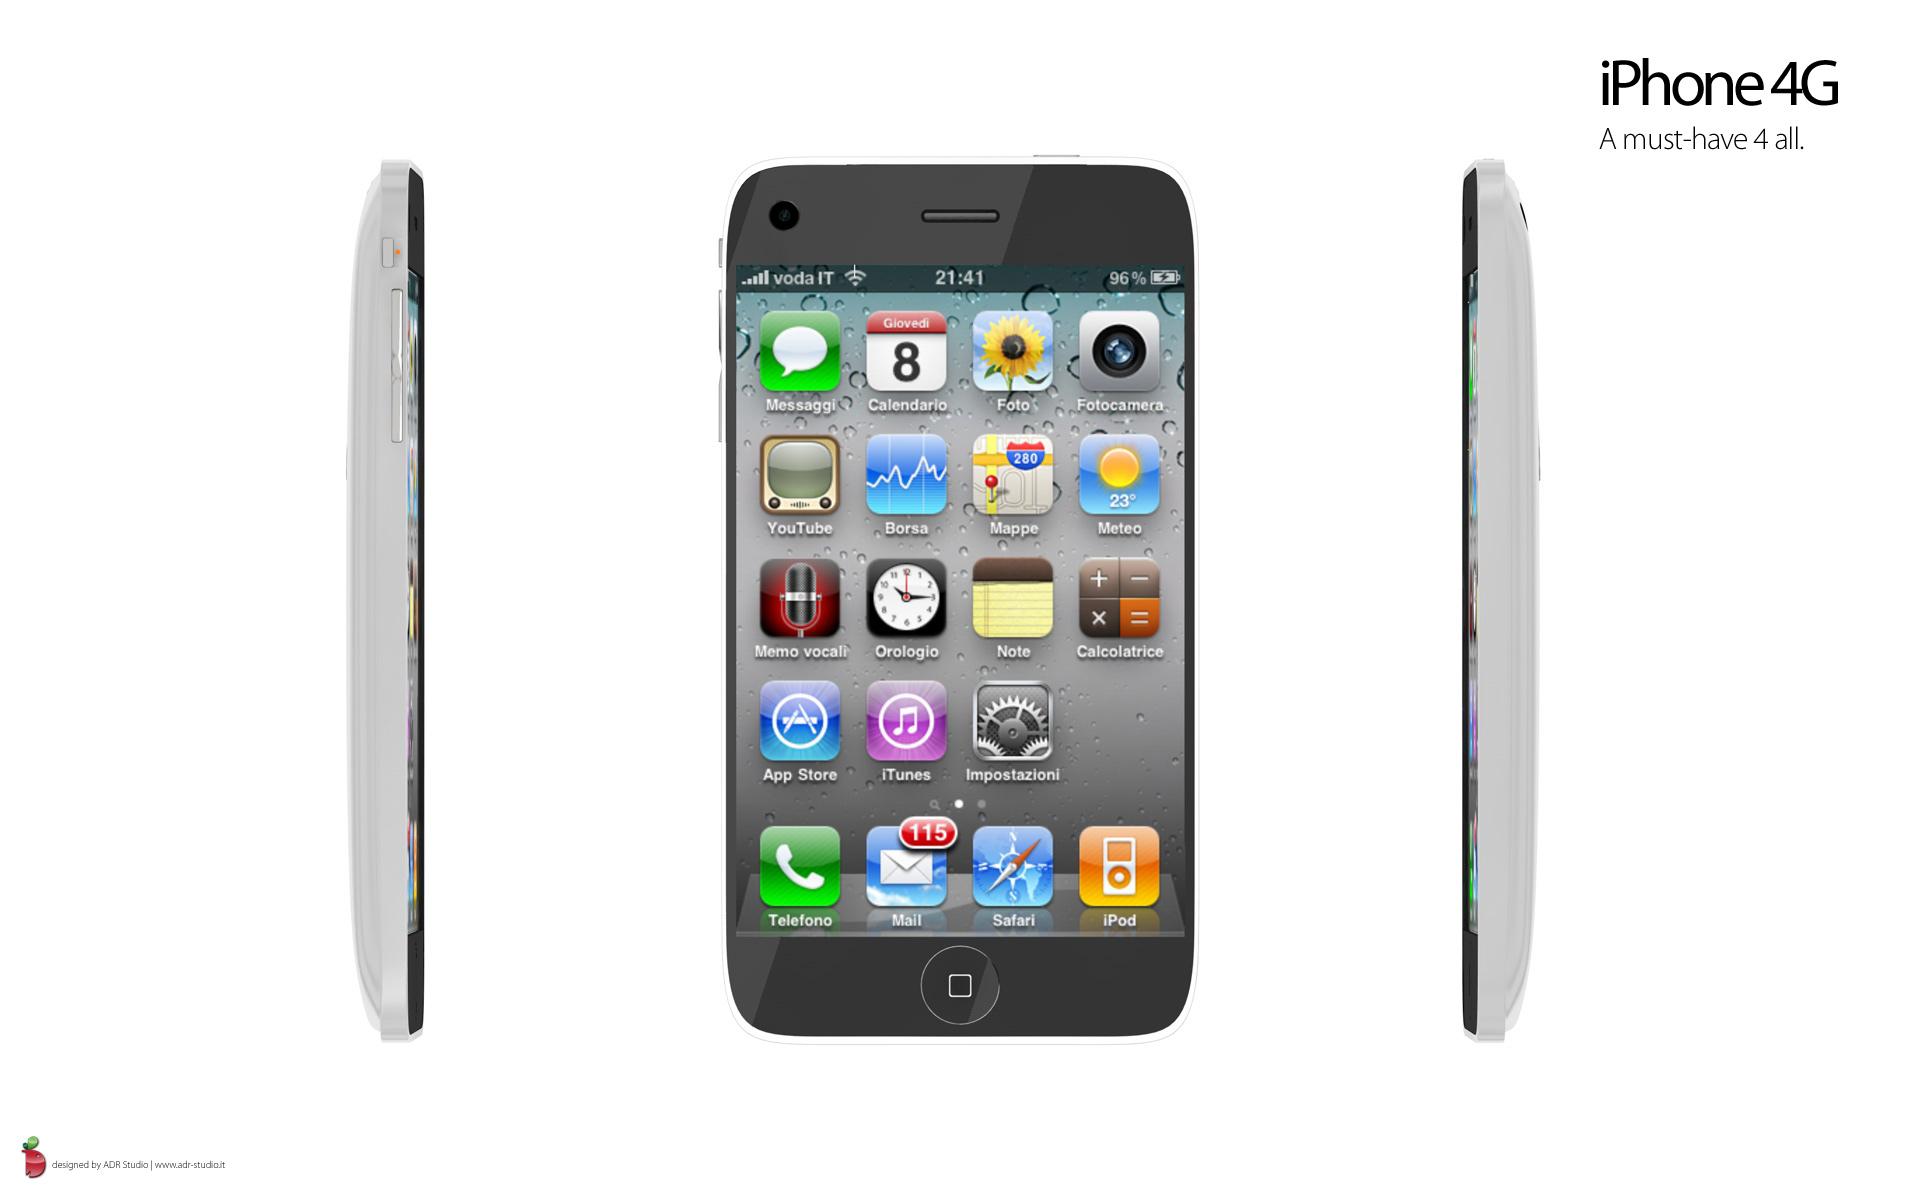 iphone 4g neues konzept mit os 4 0 giga. Black Bedroom Furniture Sets. Home Design Ideas